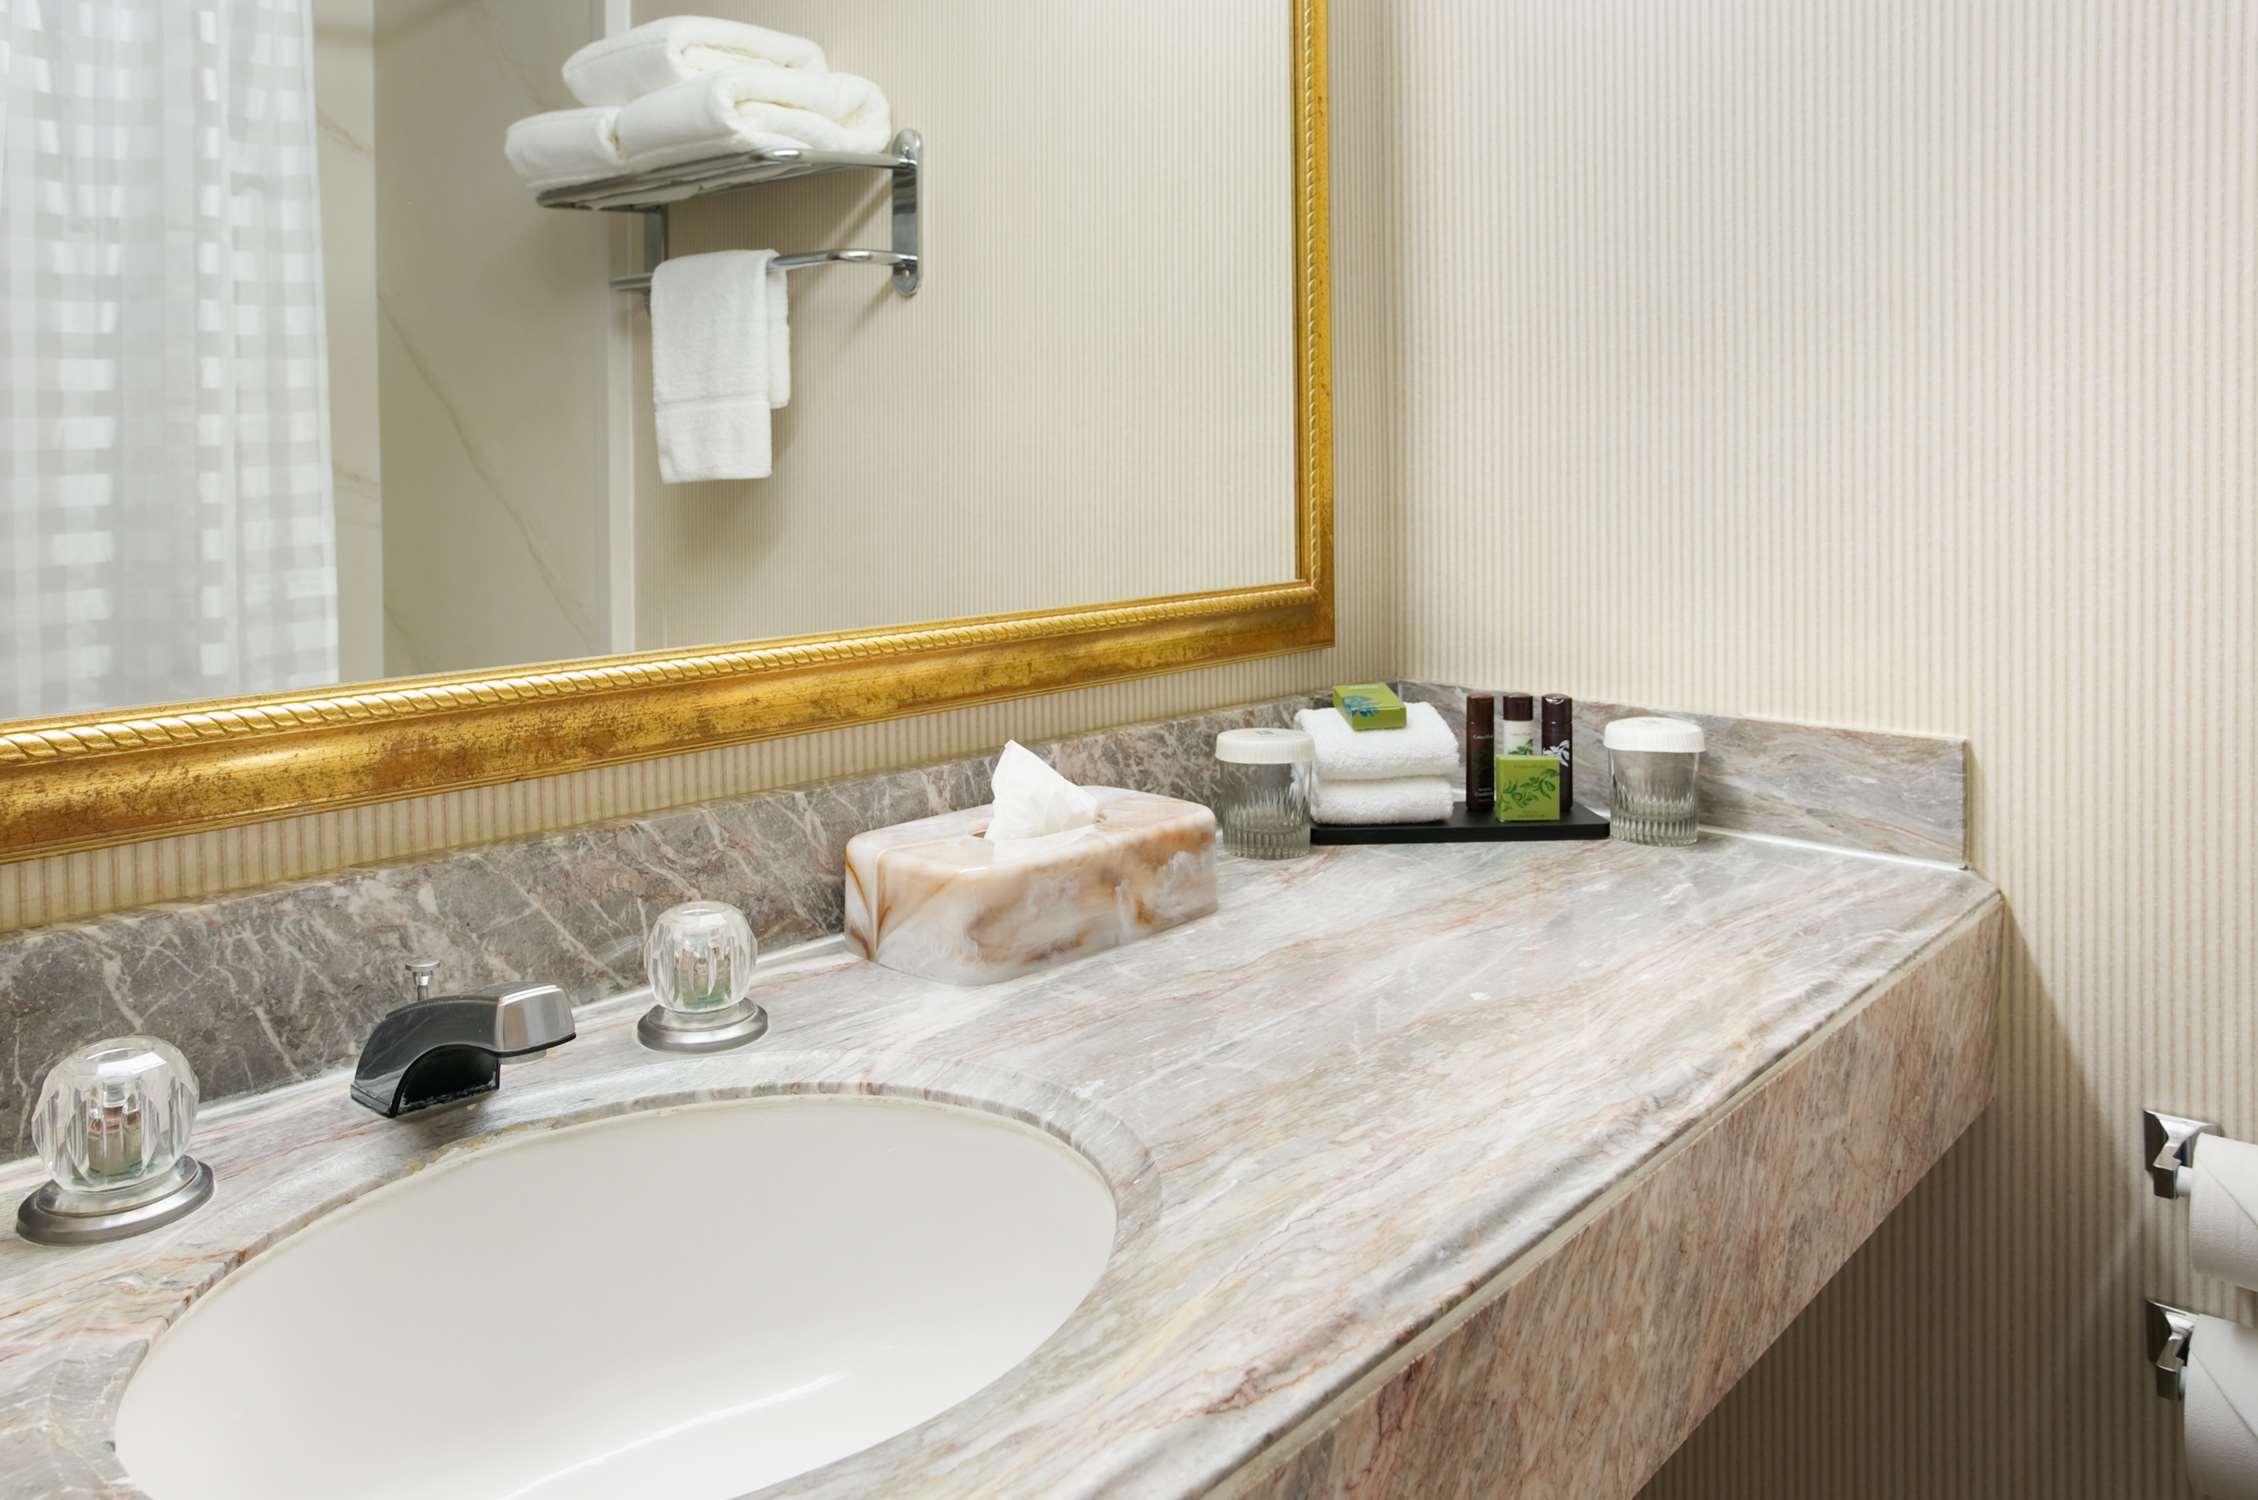 Embassy Suites by Hilton Arcadia Pasadena Area image 29